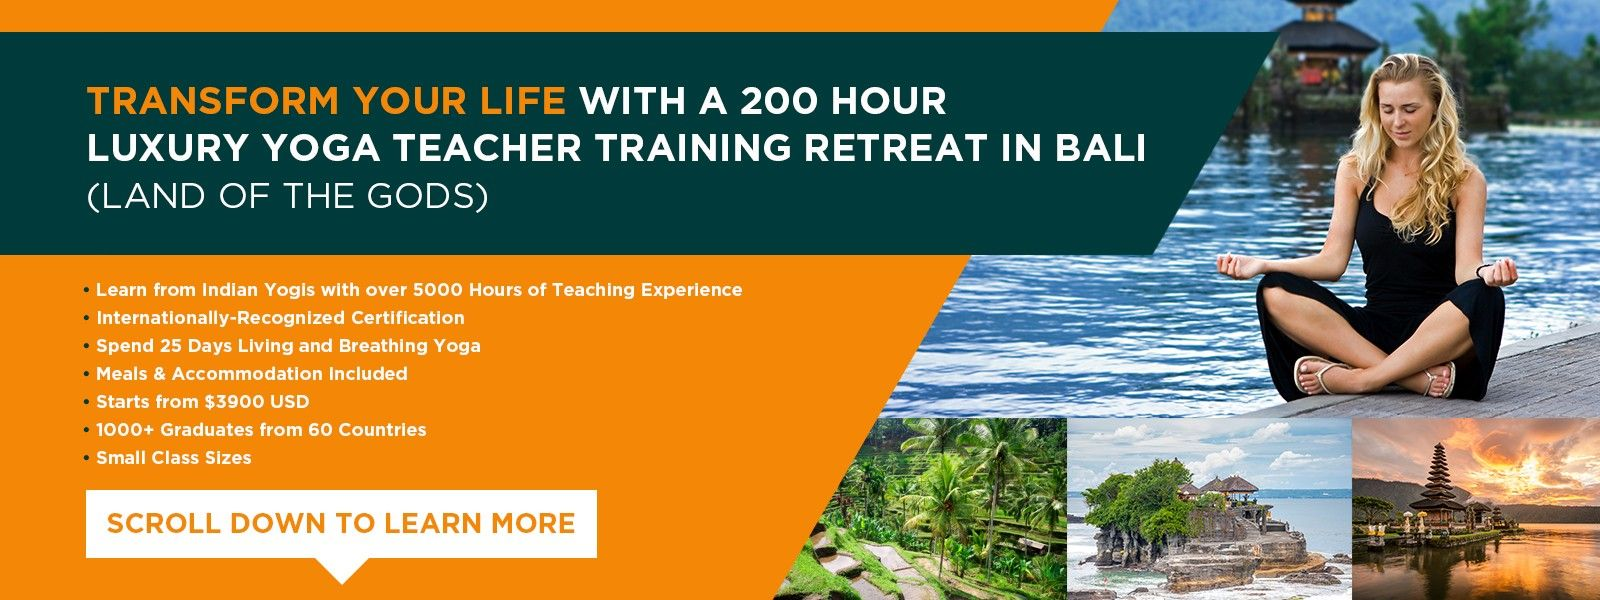 yoga teacher training in ubud bali